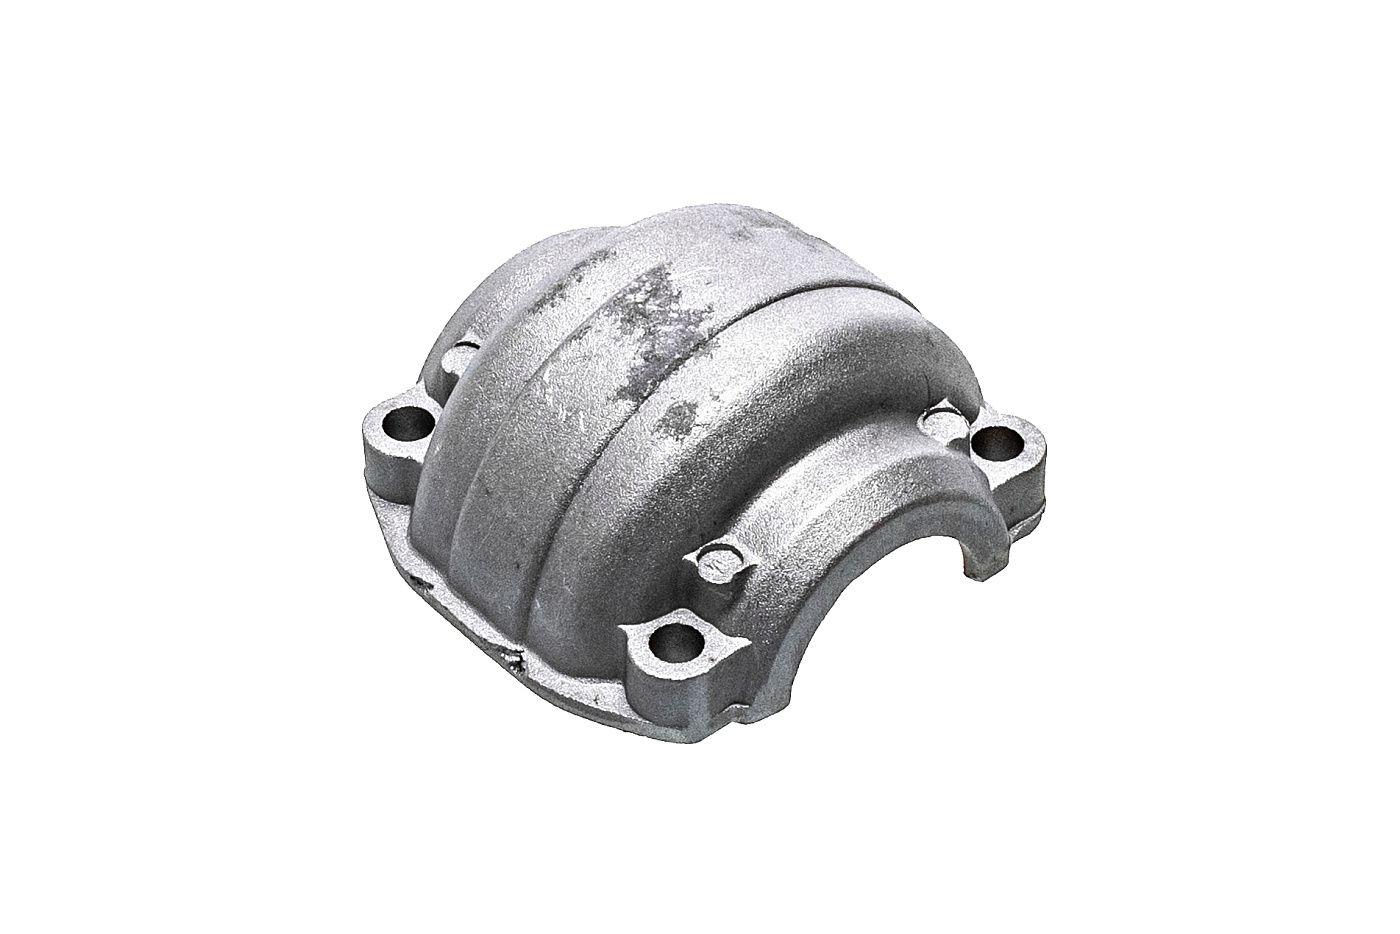 Spodný kryt motora Husqvarna 136 141 137 142